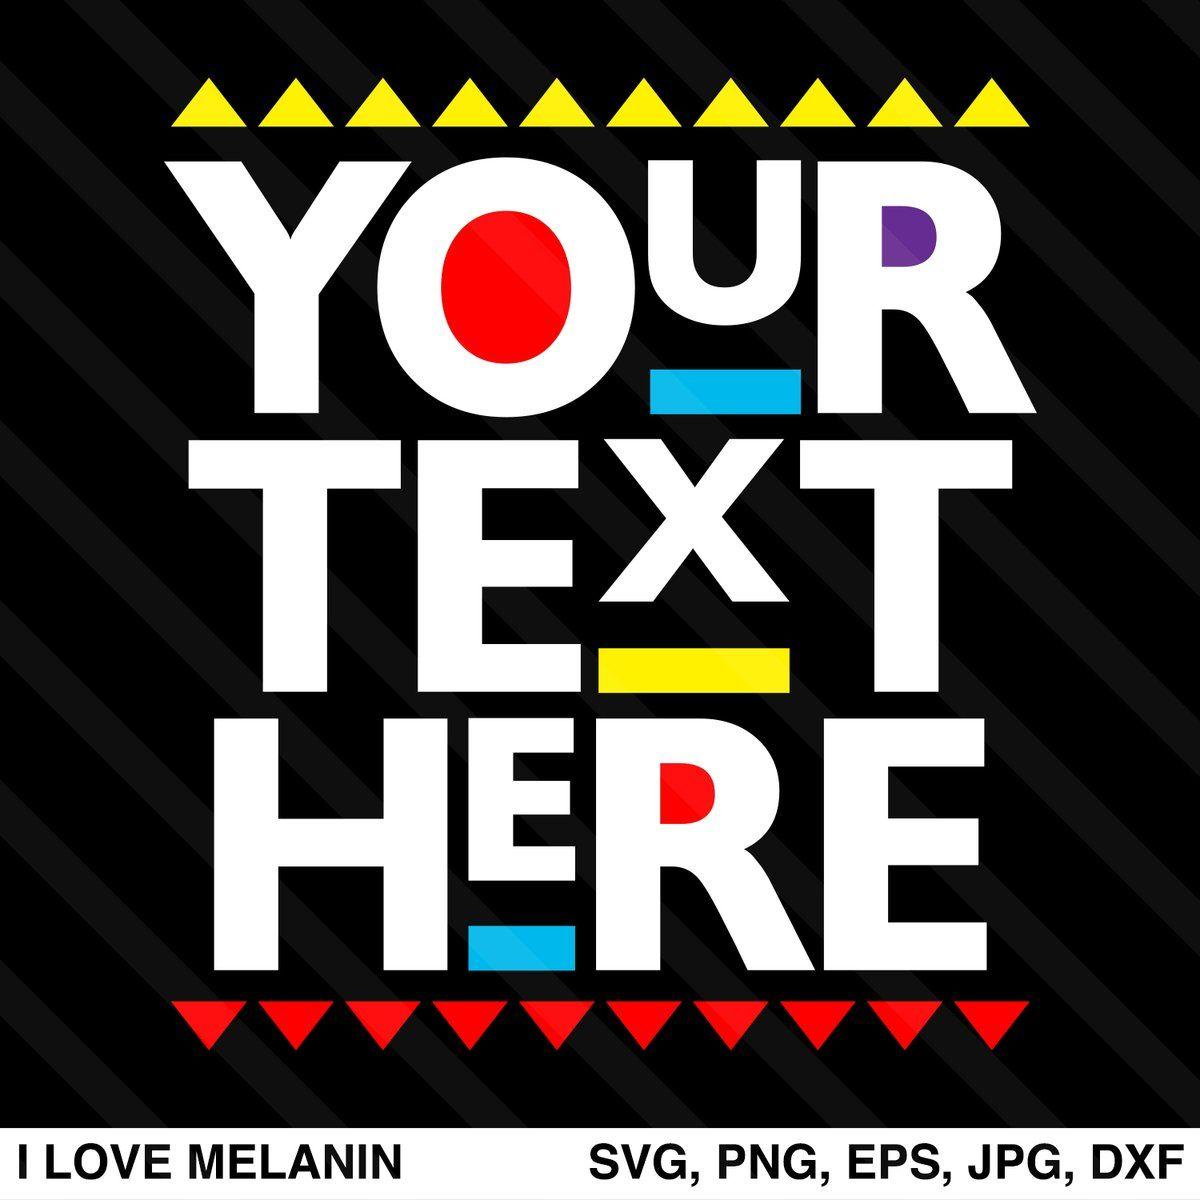 Download Martin Font Custom Design SVG in 2020 | Graffiti text ...